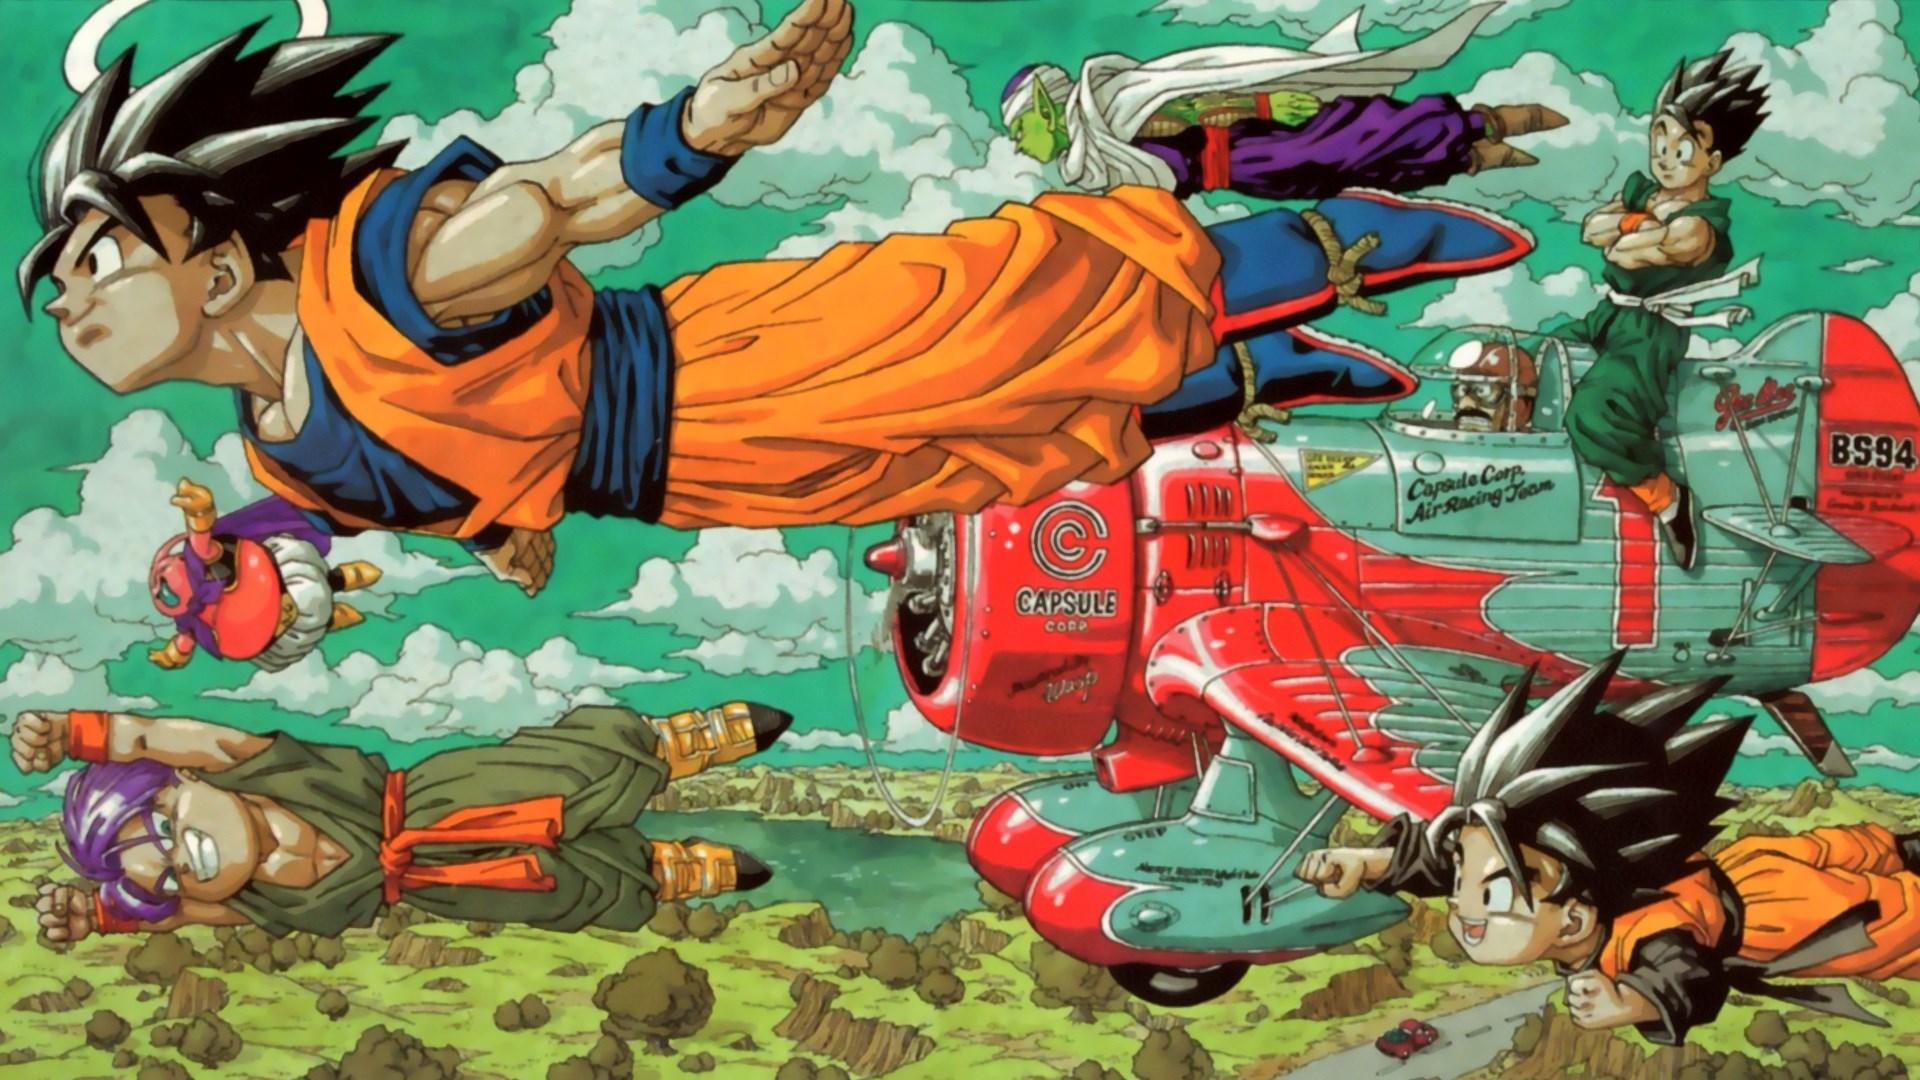 Dragon Ball Z HD Wallpapers 1920x1080